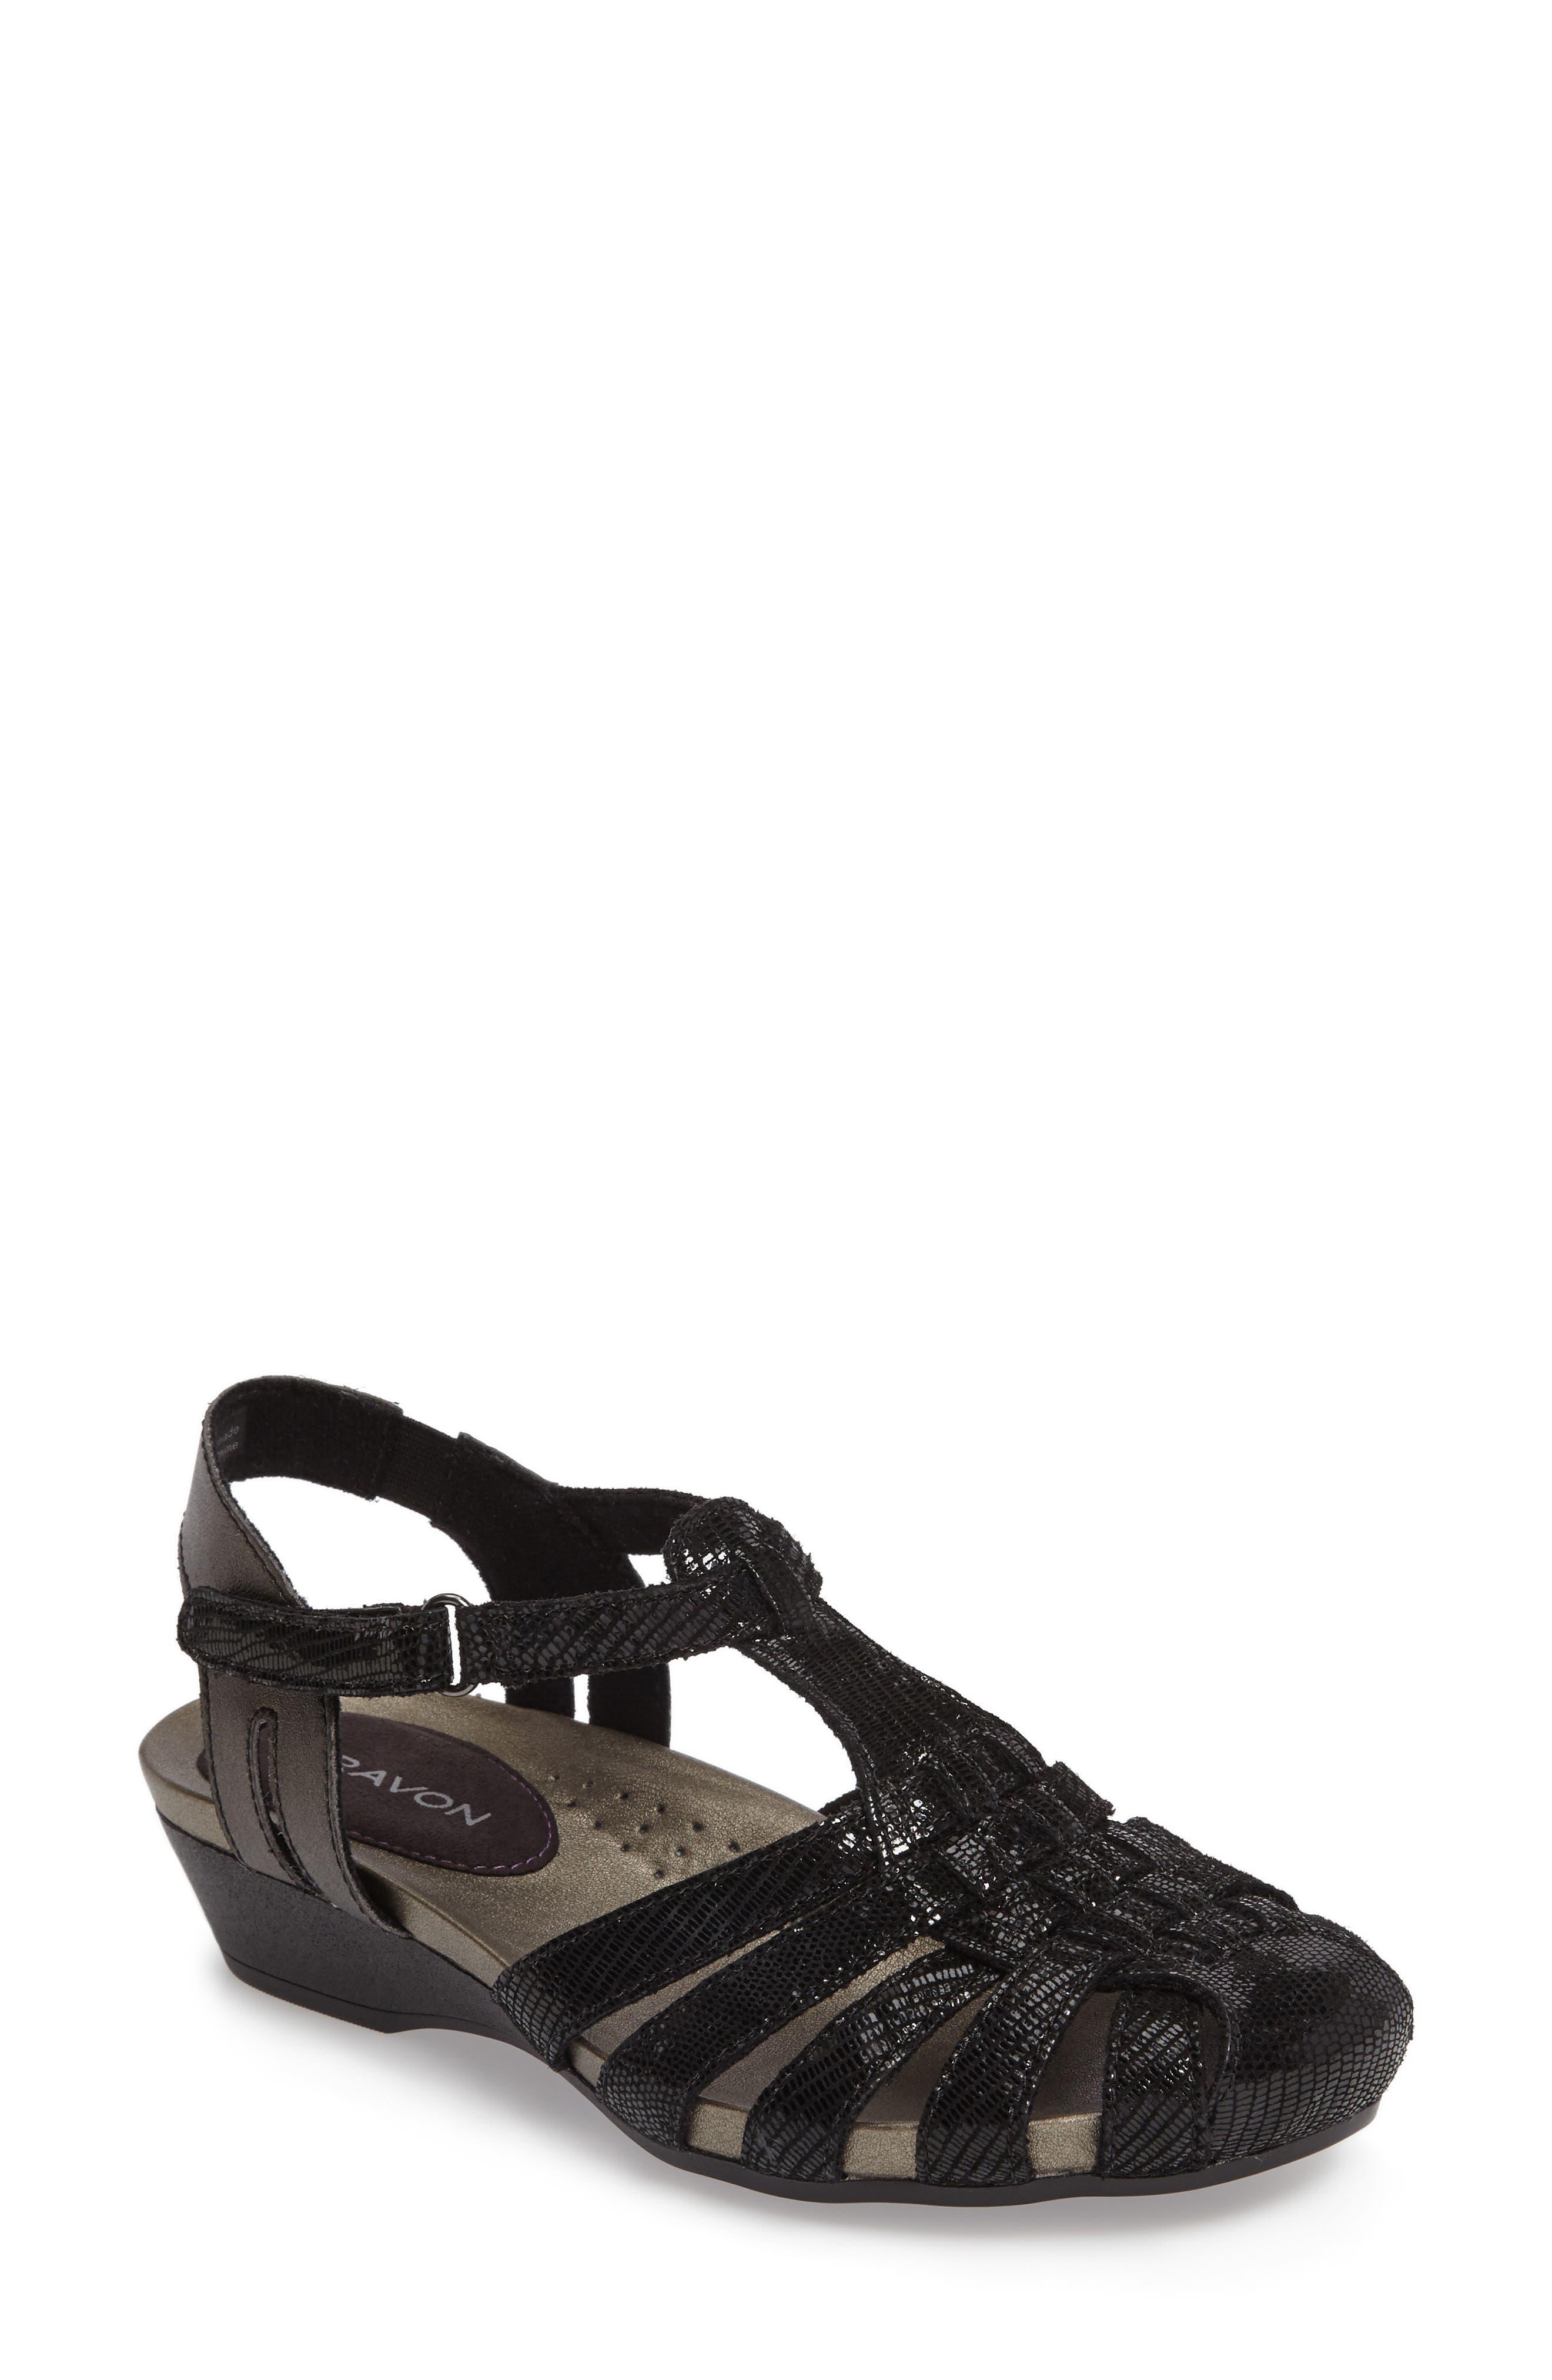 Standon Wedge Sandal,                         Main,                         color, BLACK FABRIC